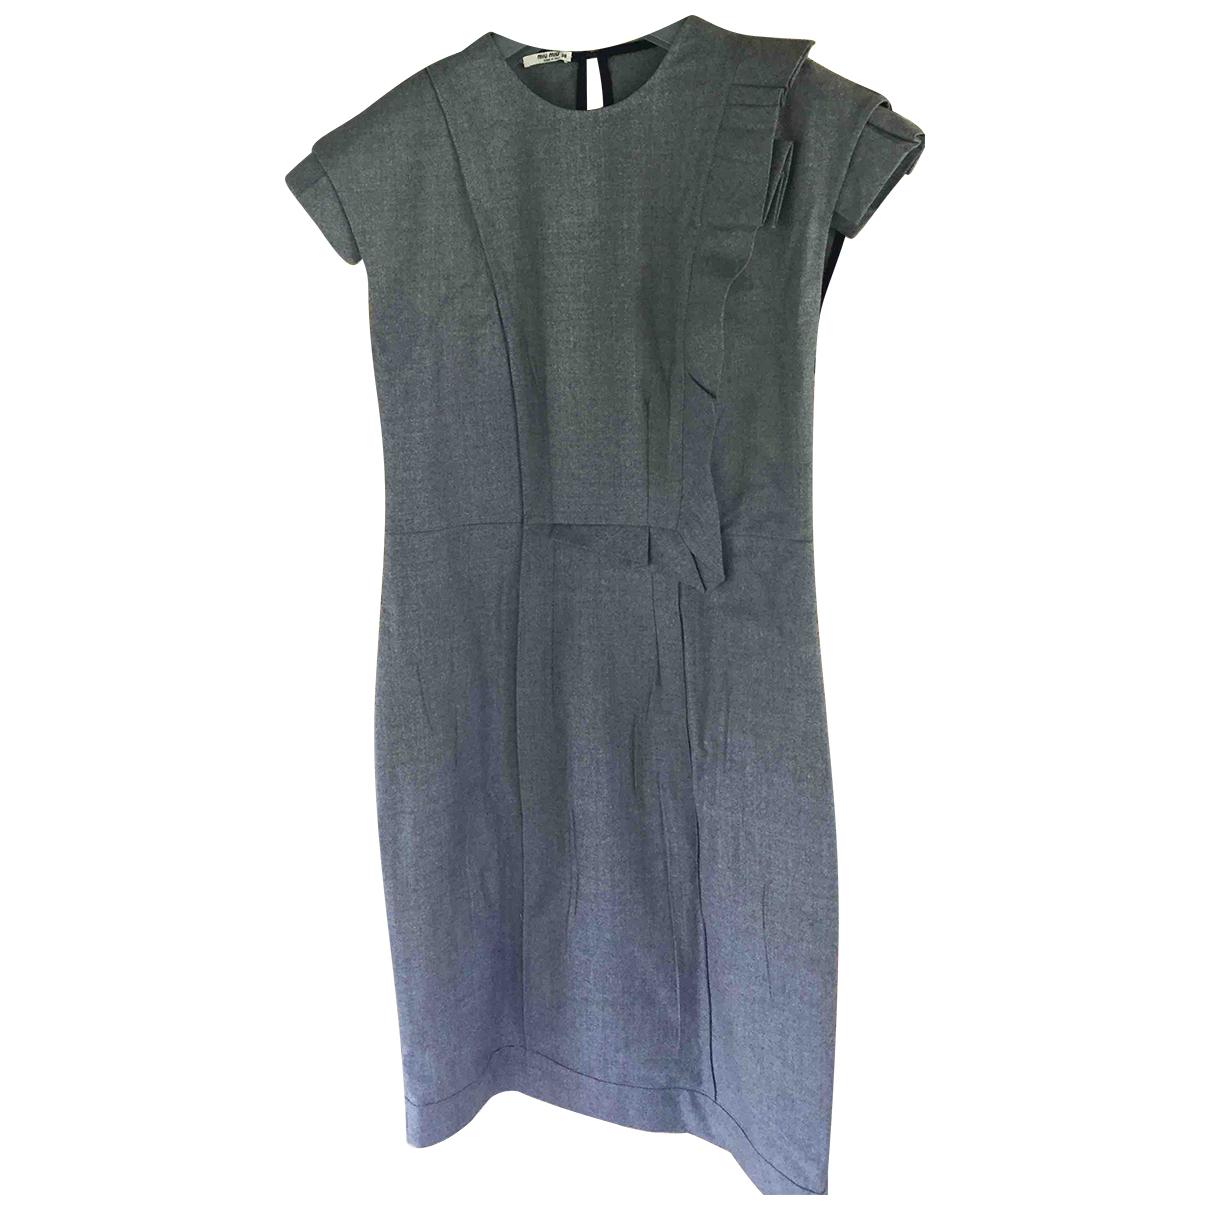 Miu Miu N Grey Wool dress for Women 38 IT